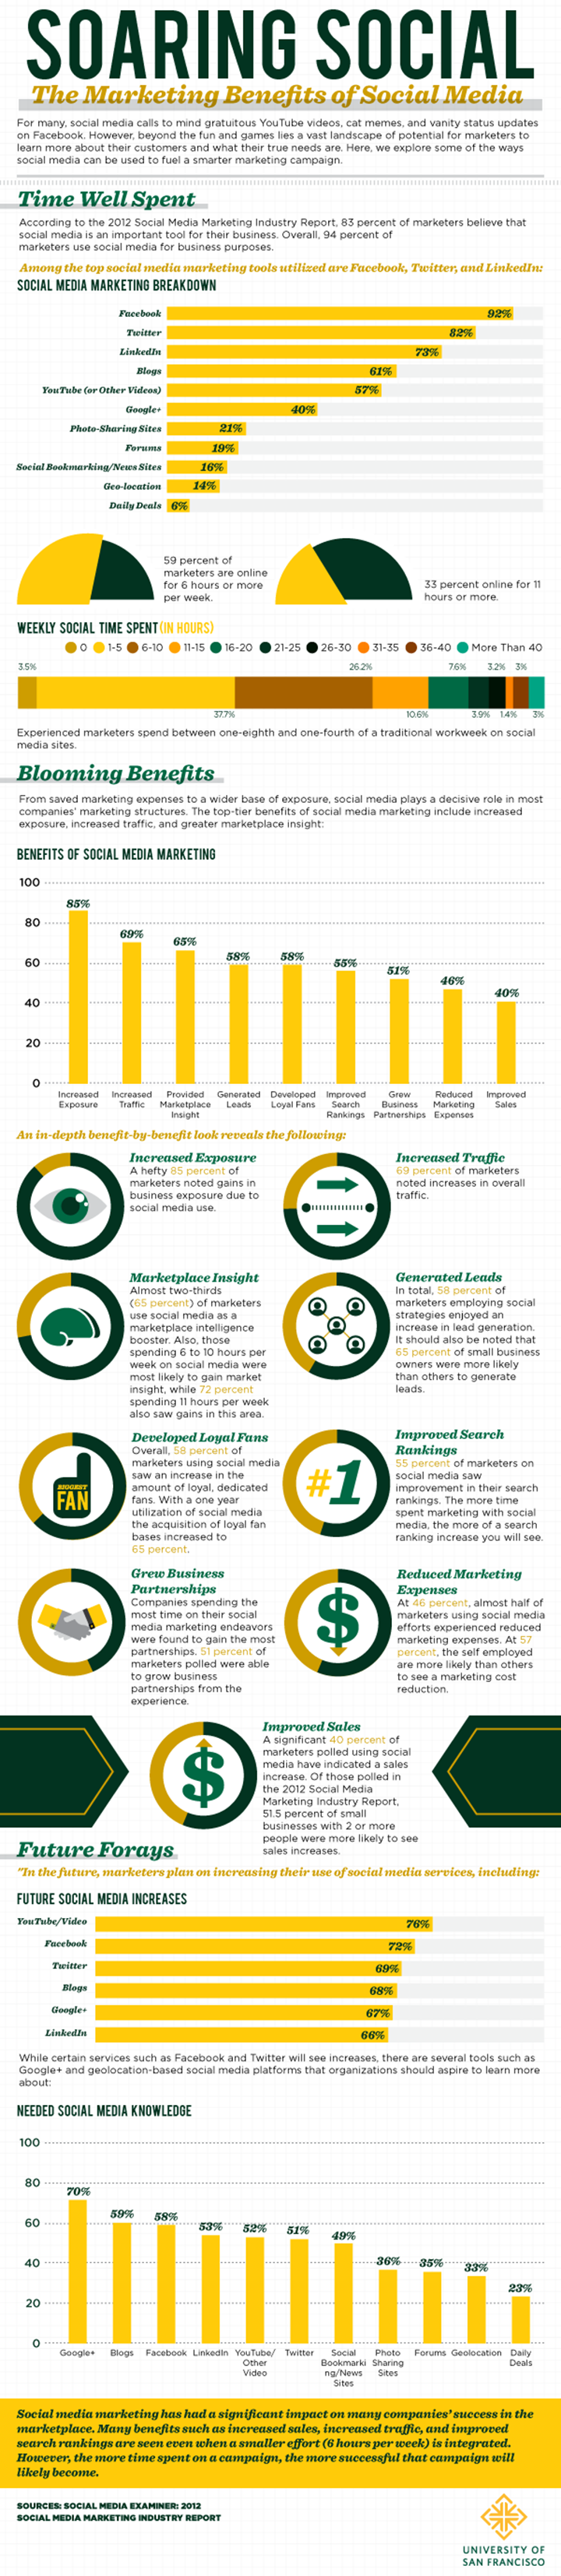 infographic-soaring_social_media